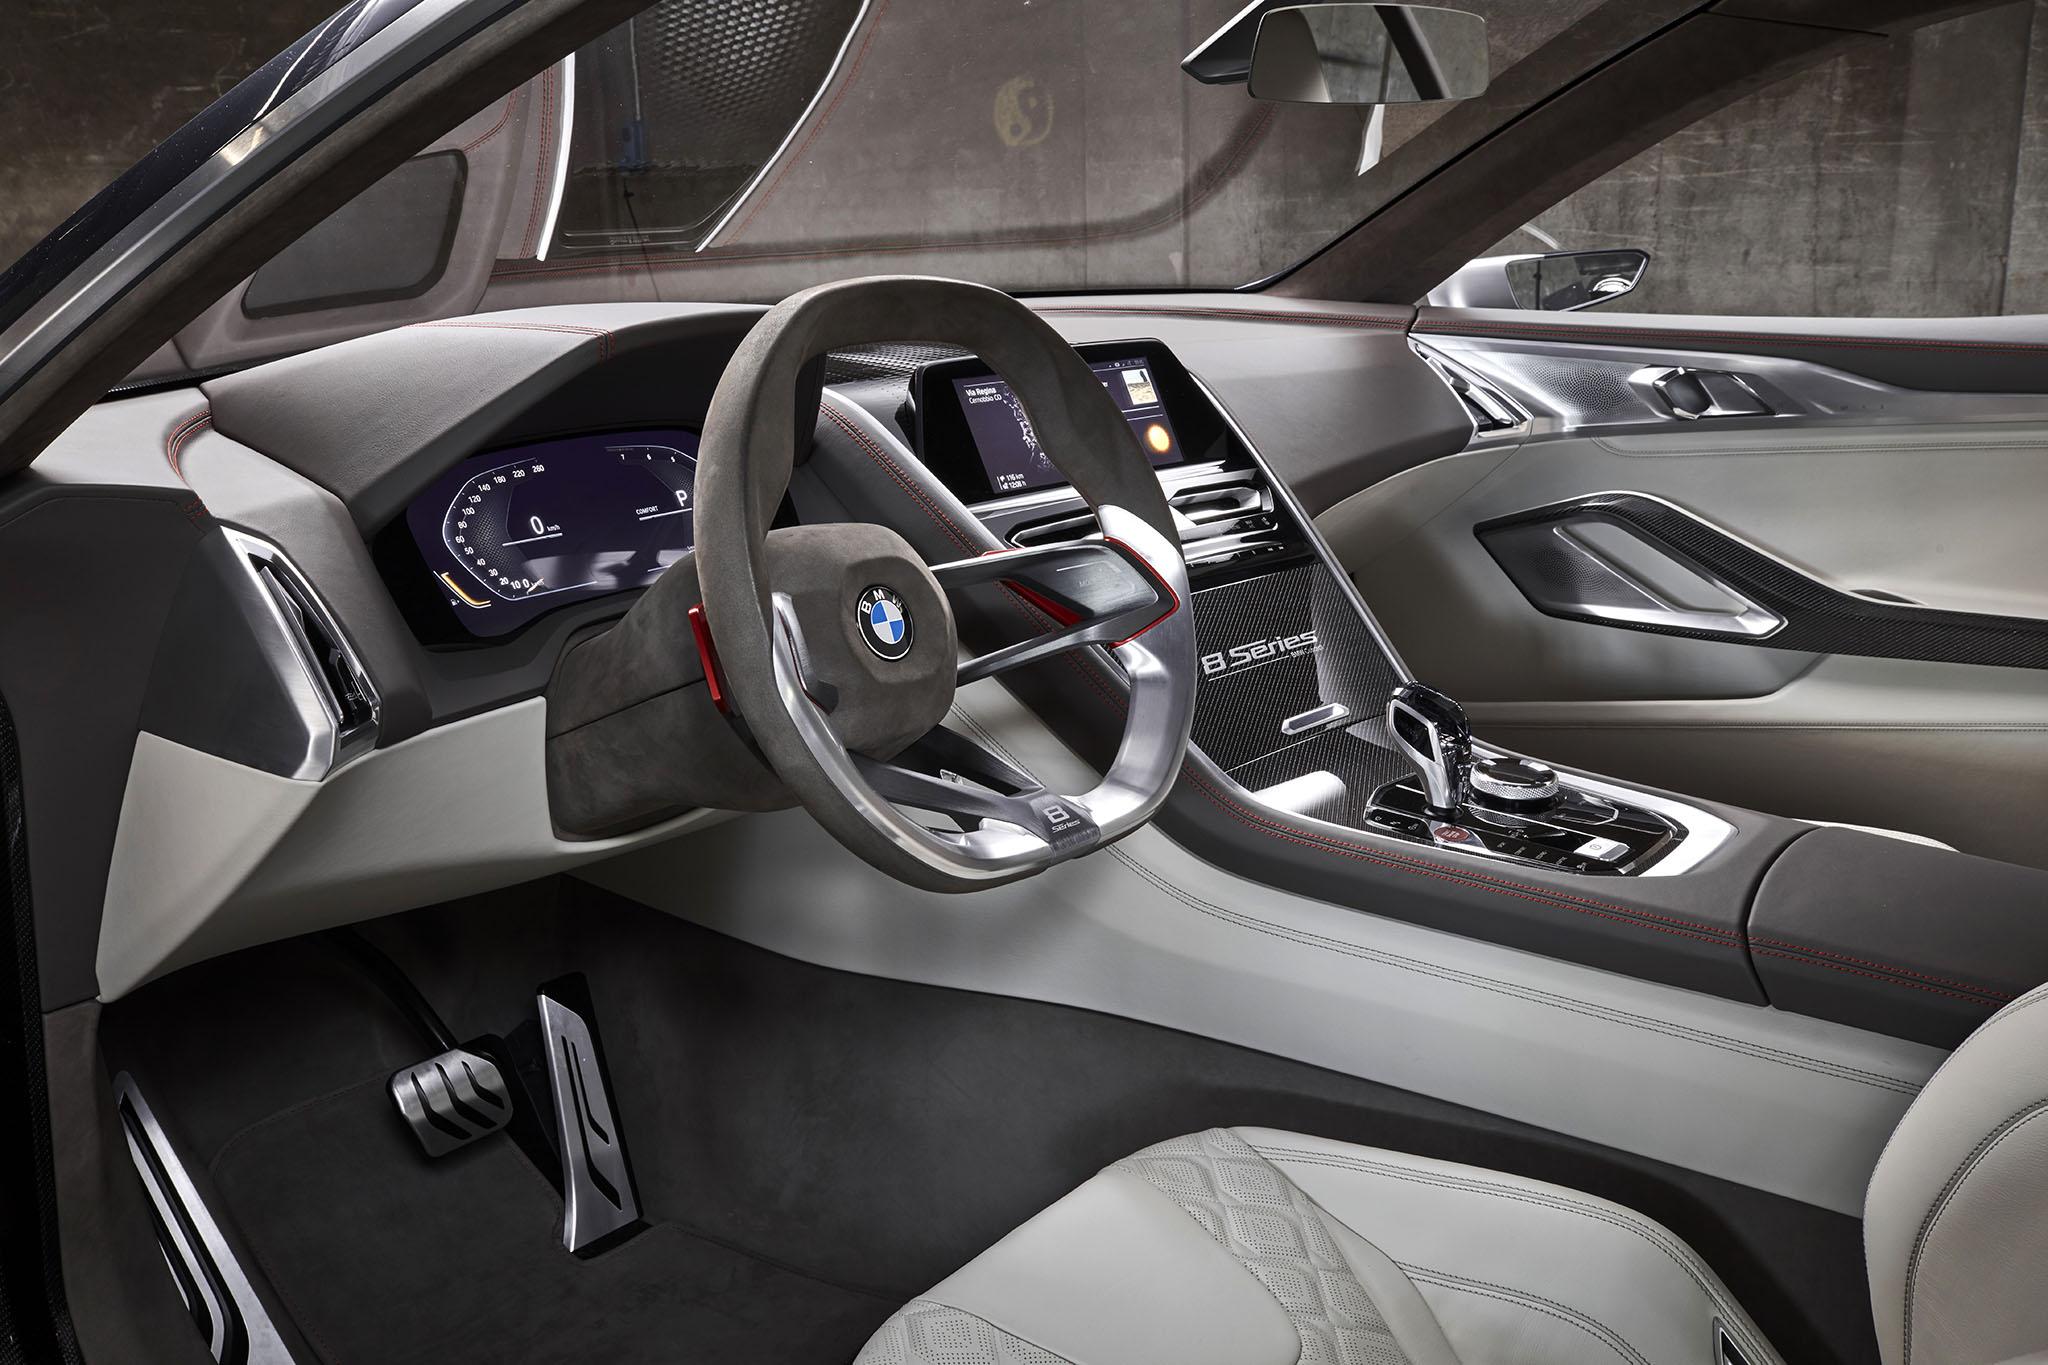 2017 BMW 8 Series Concept 7 2048x1365